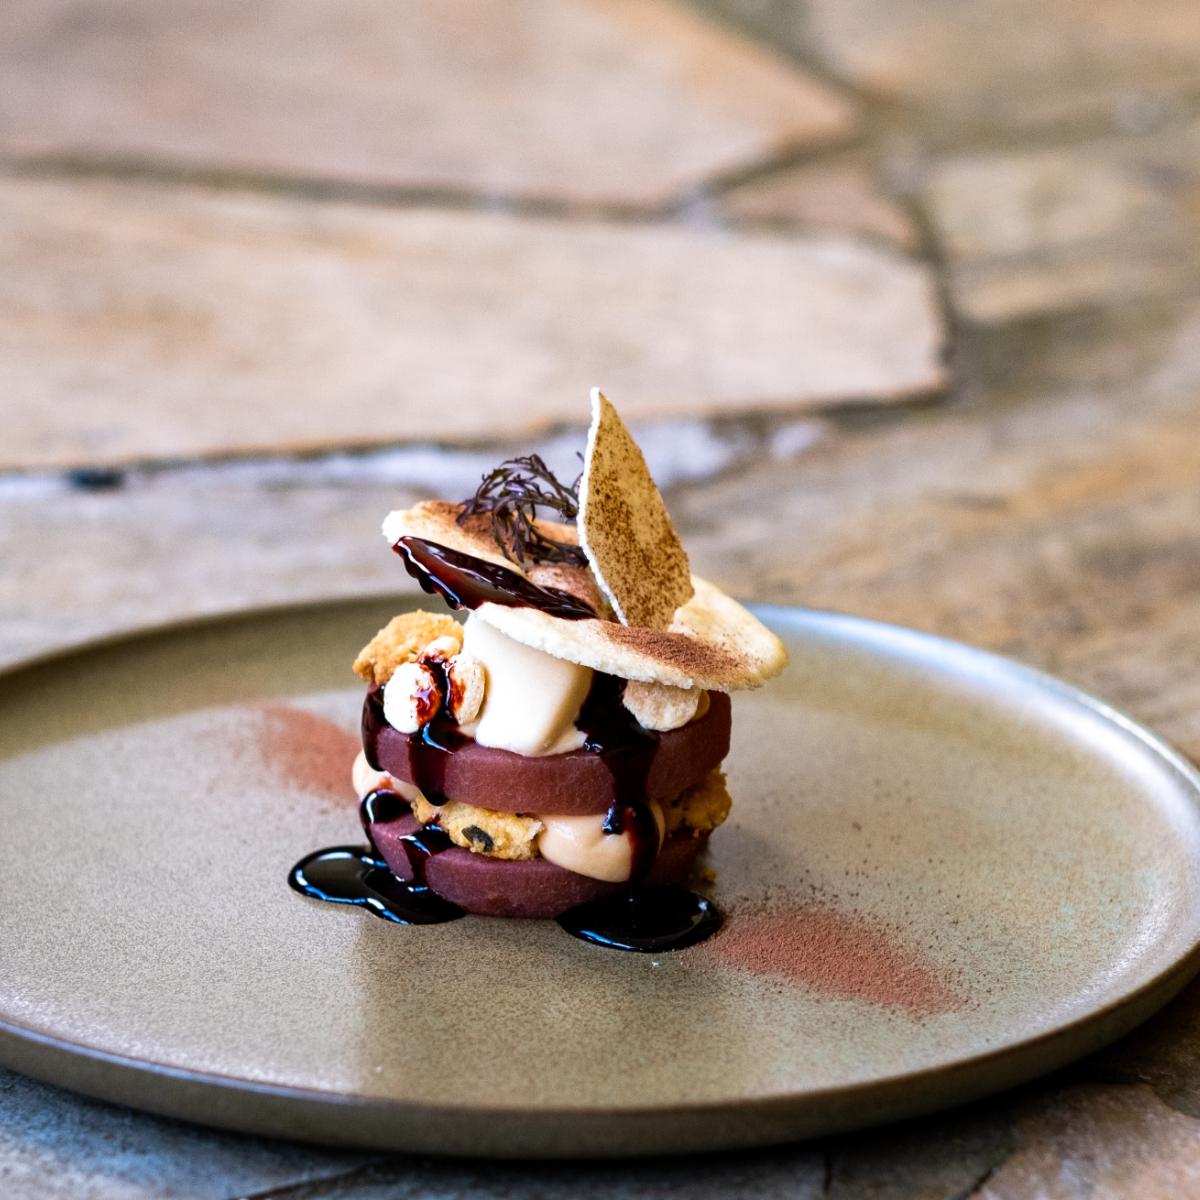 Tante Fichte Berlin Birne Dessert by Mischa Fanghaenel